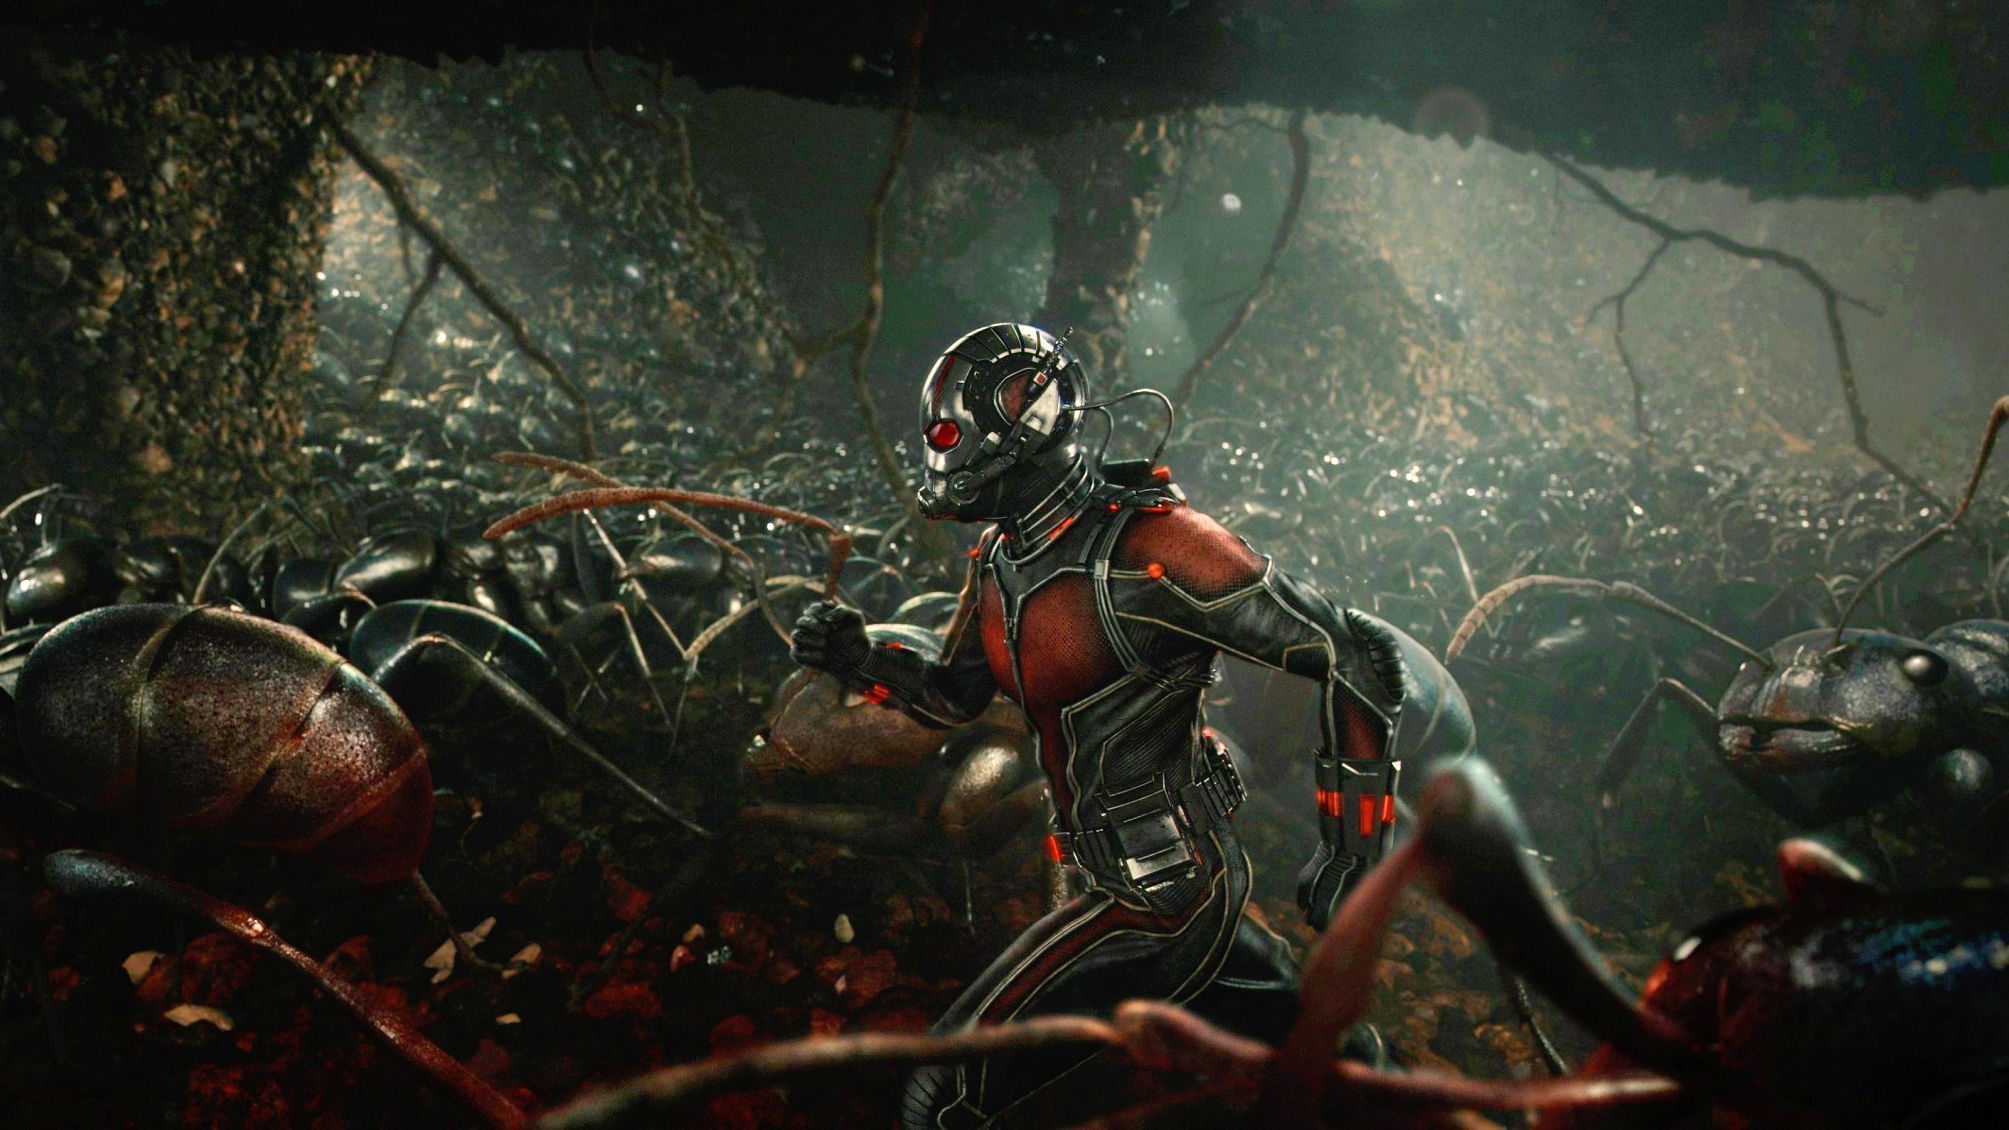 25. Ant-Man